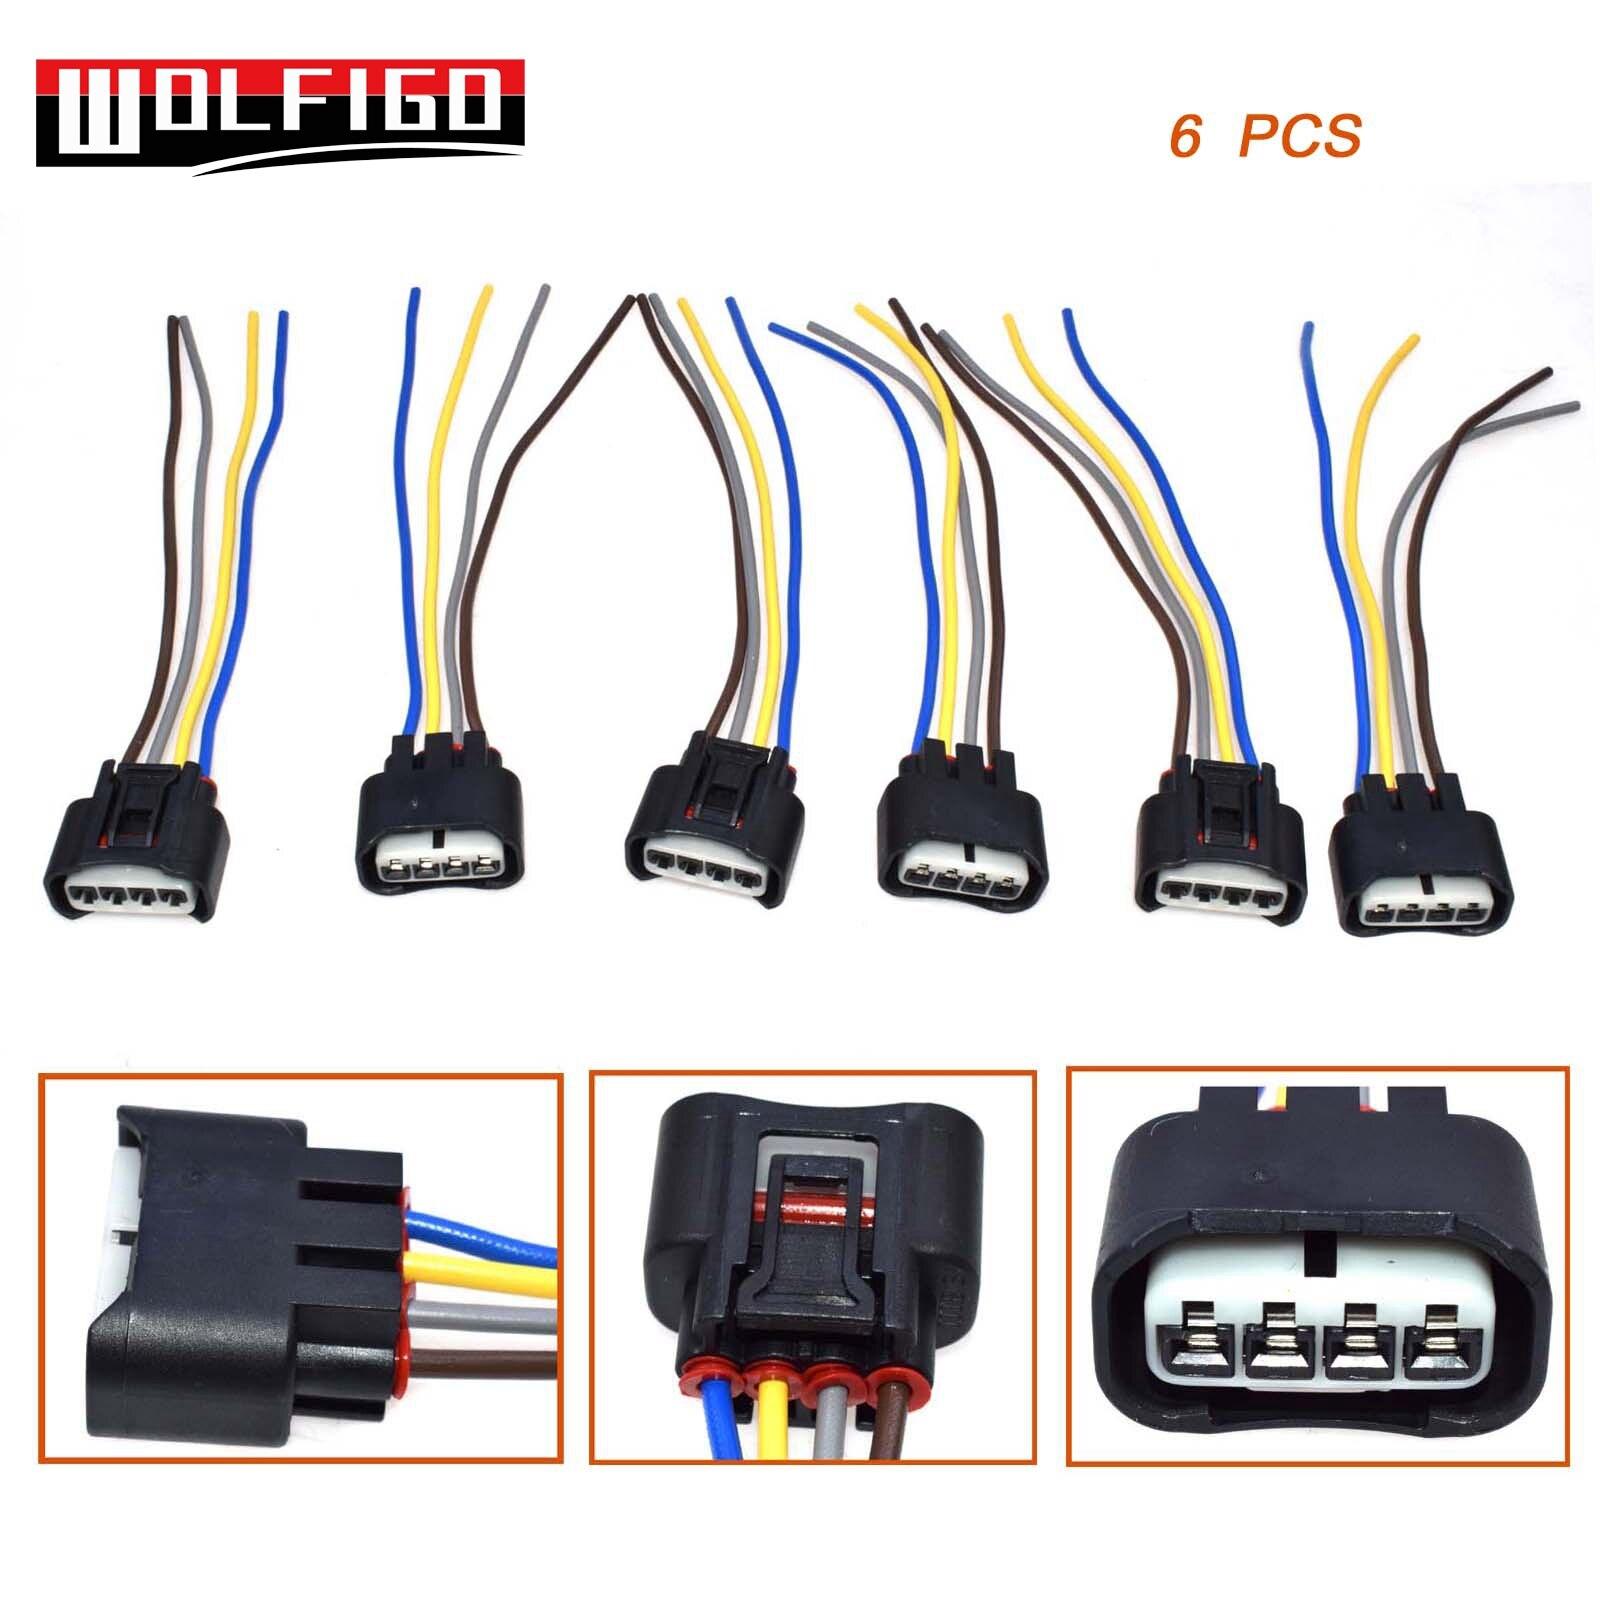 4pcs Ignition Coil Female Connector Plug Harness For 2005-2010 Scion tC 2.4L